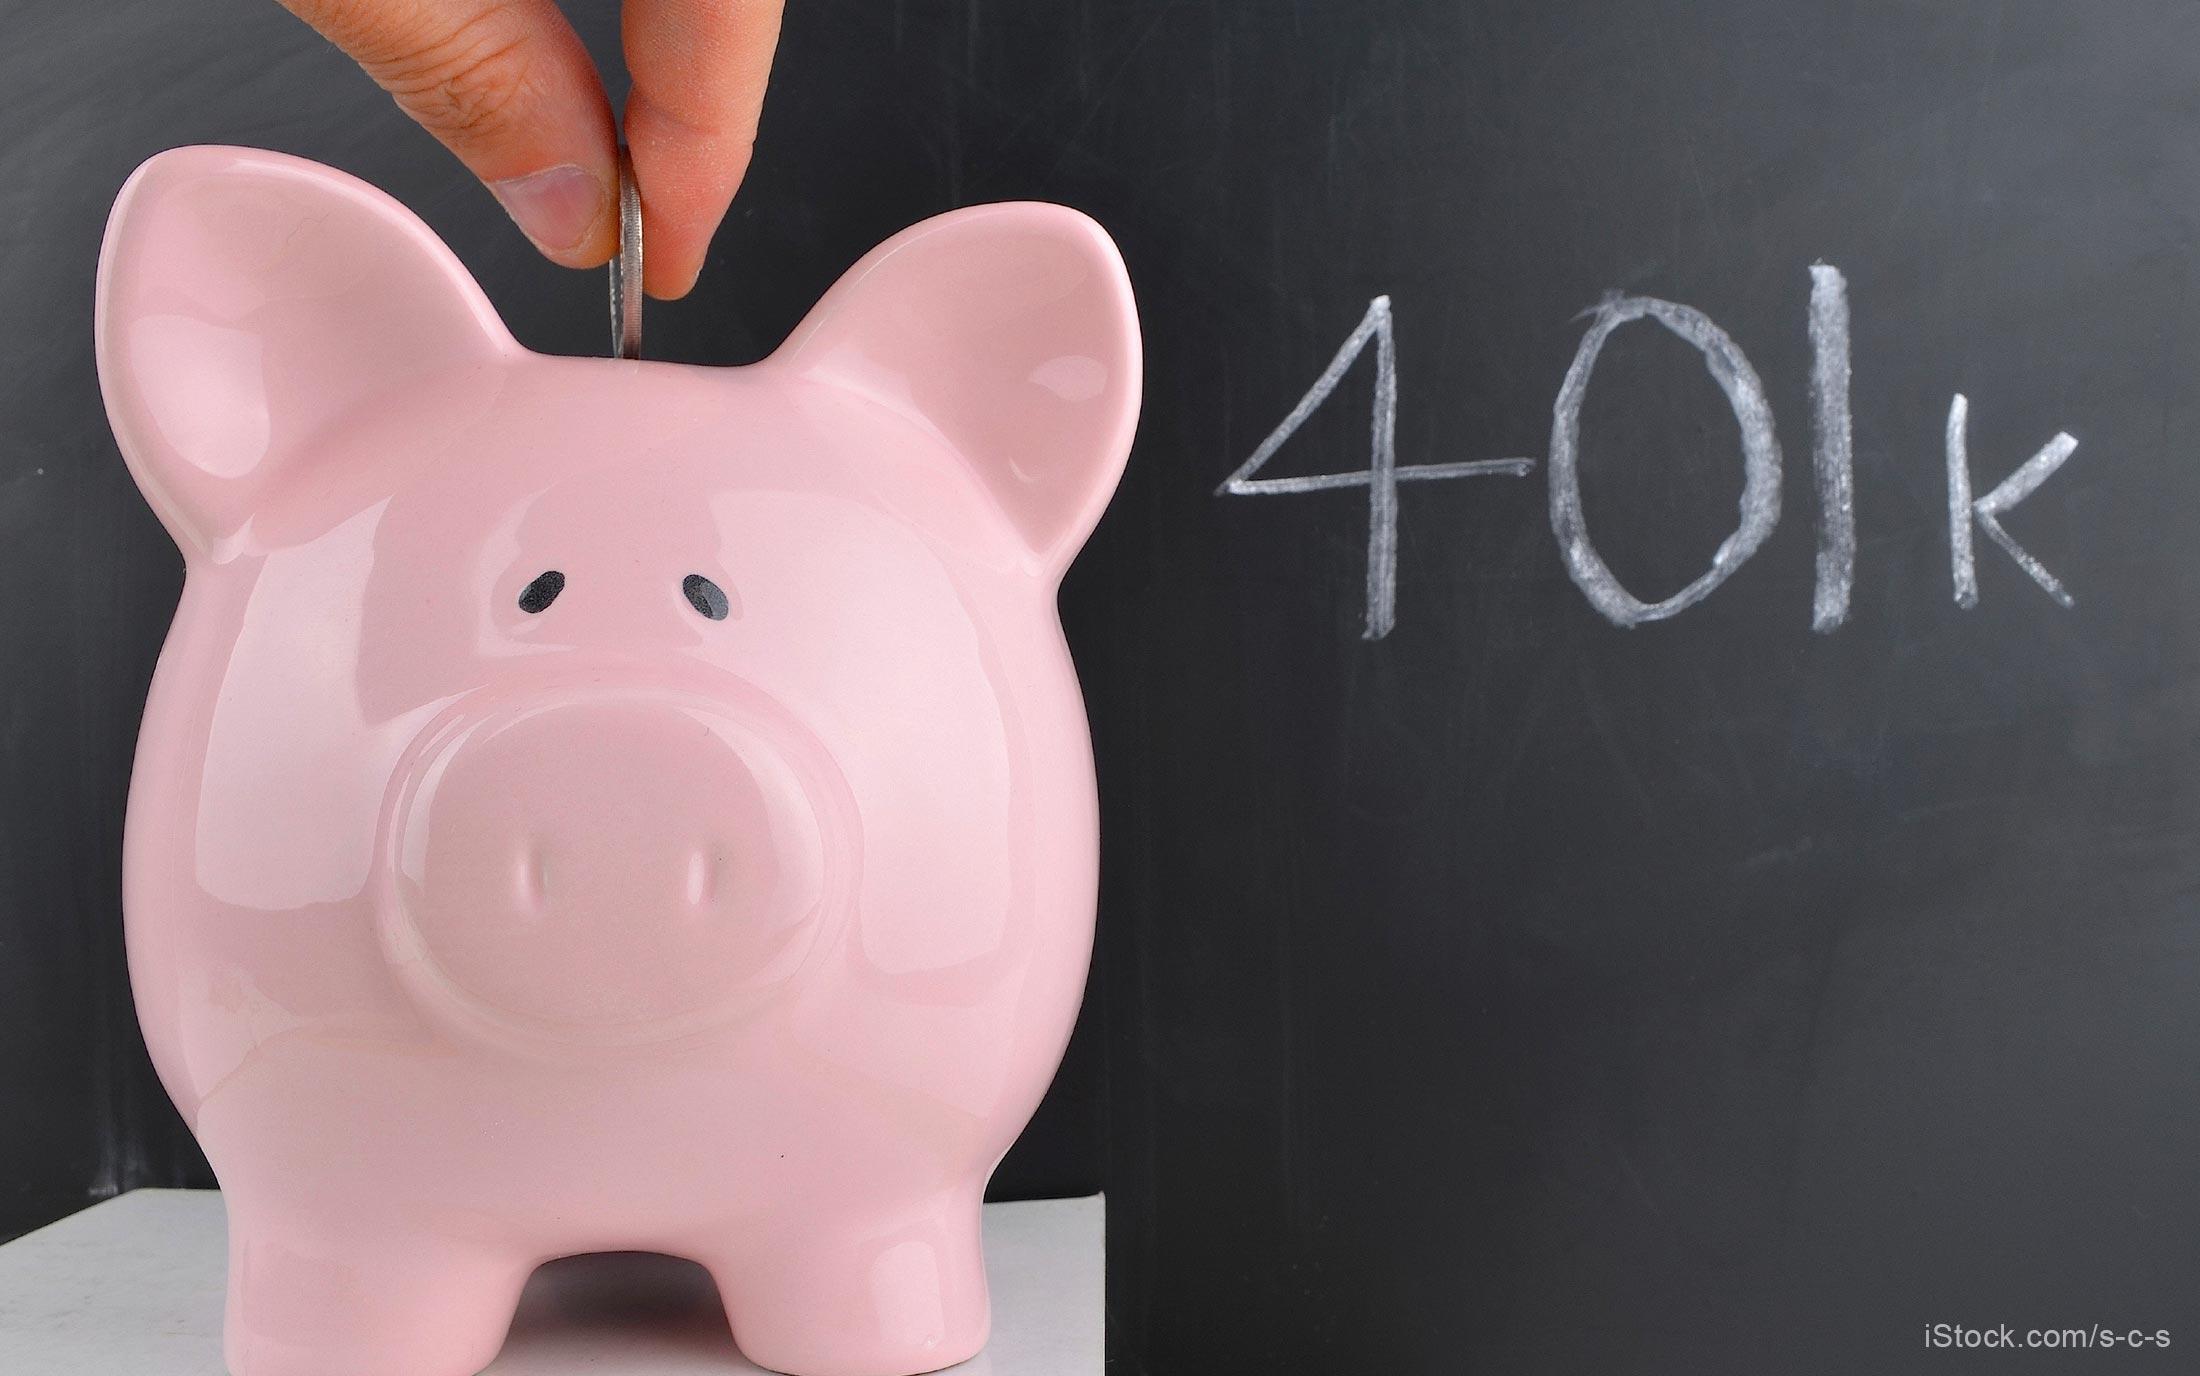 401k employer contribution